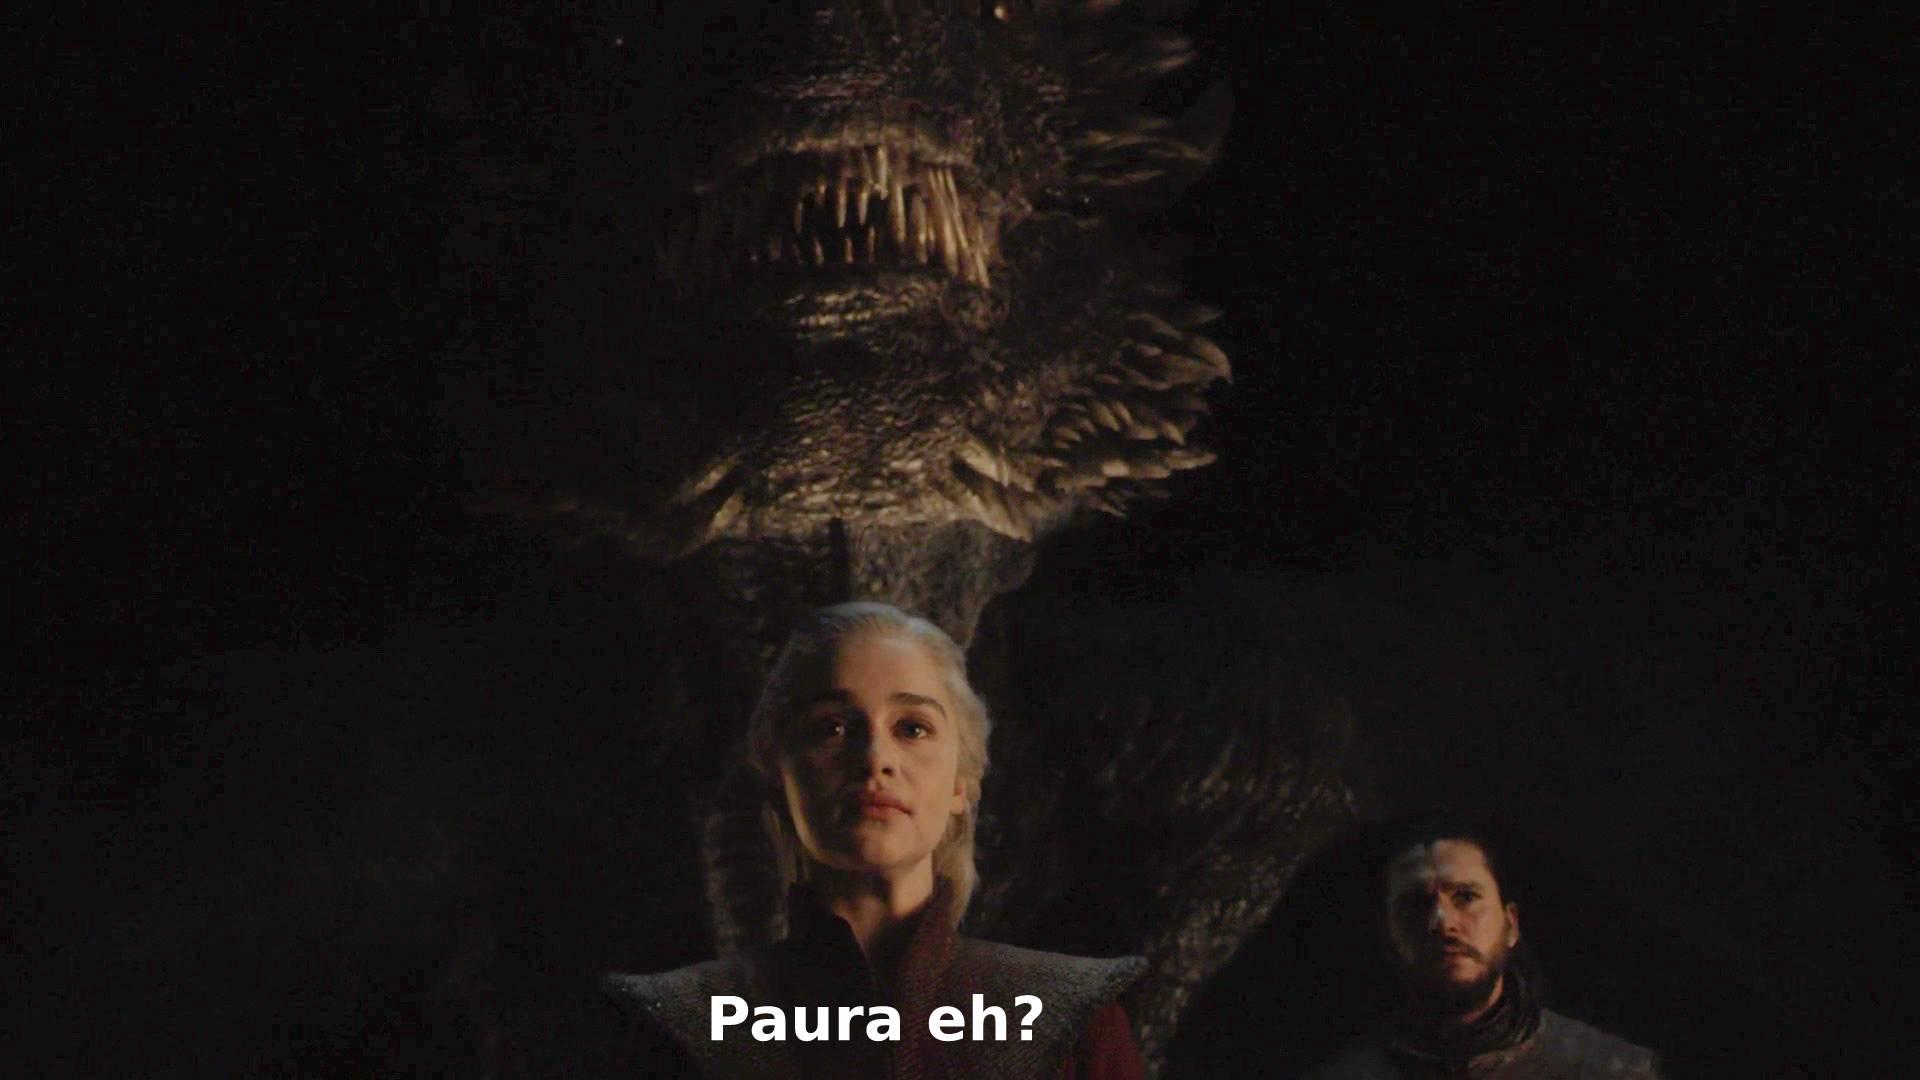 Game-of-Thrones-8x05-05_editededited